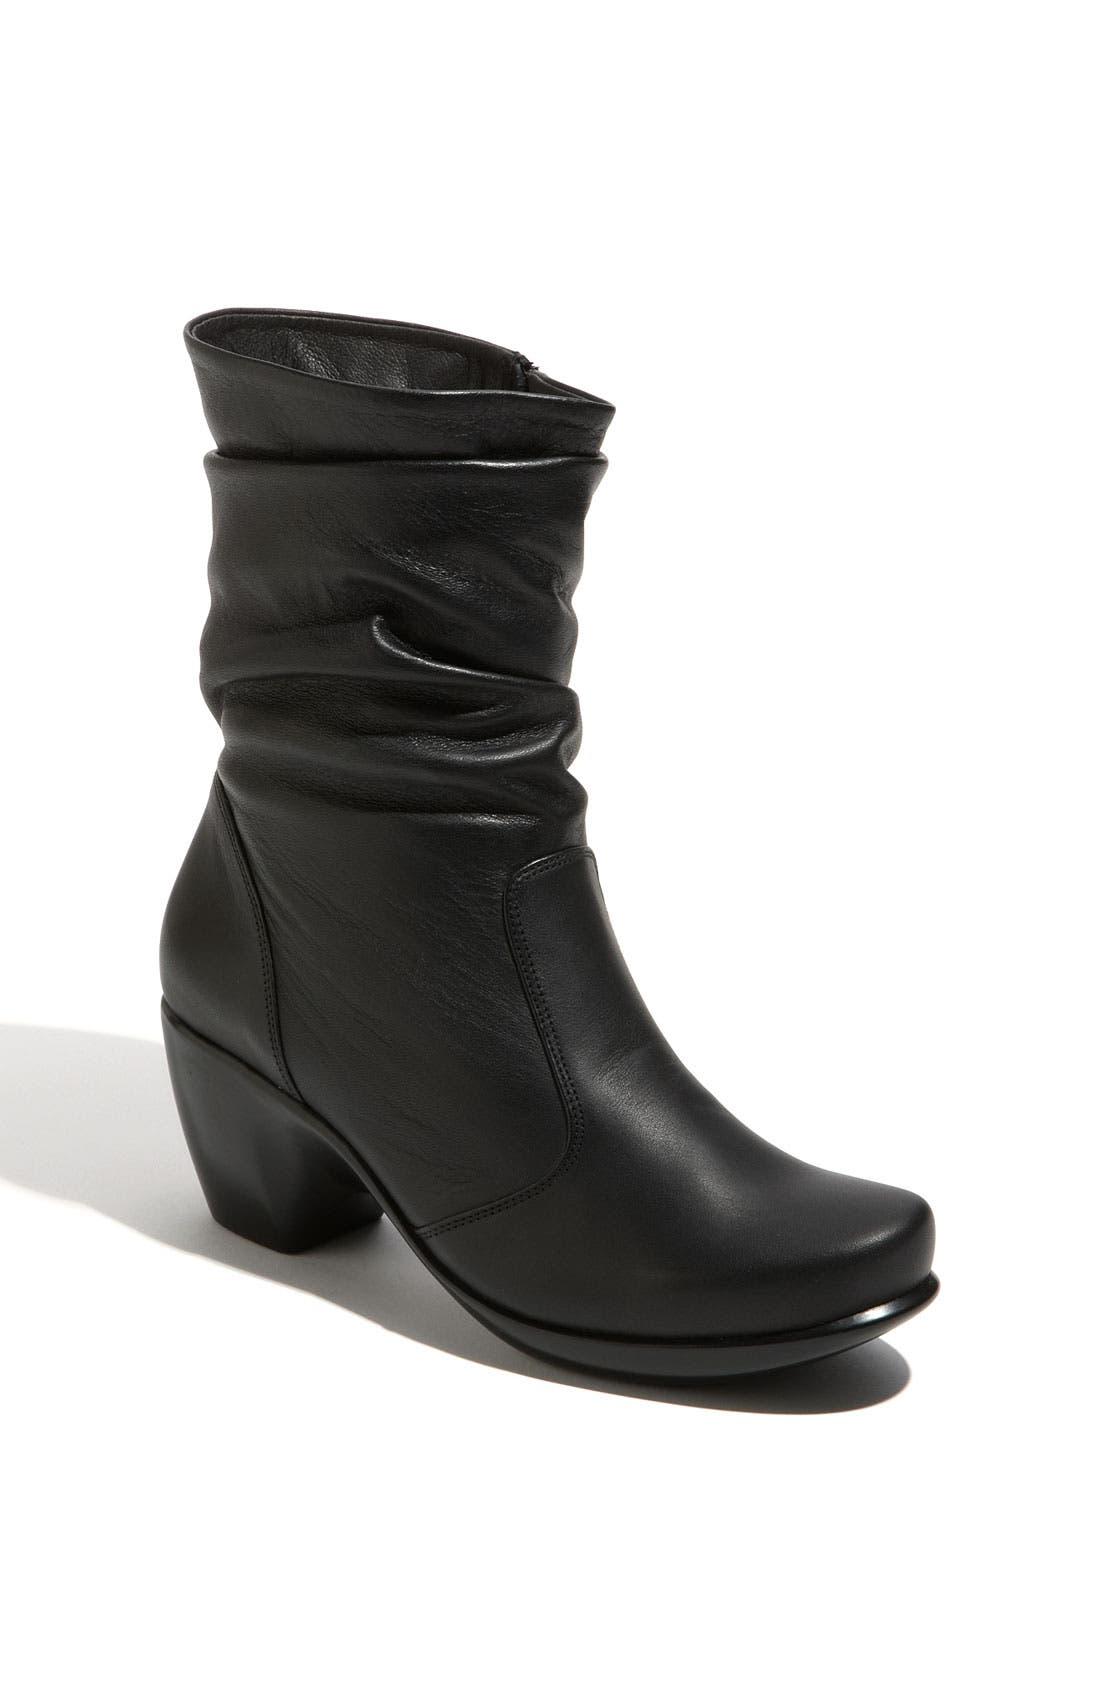 Main Image - Naot 'Modesto' Boot